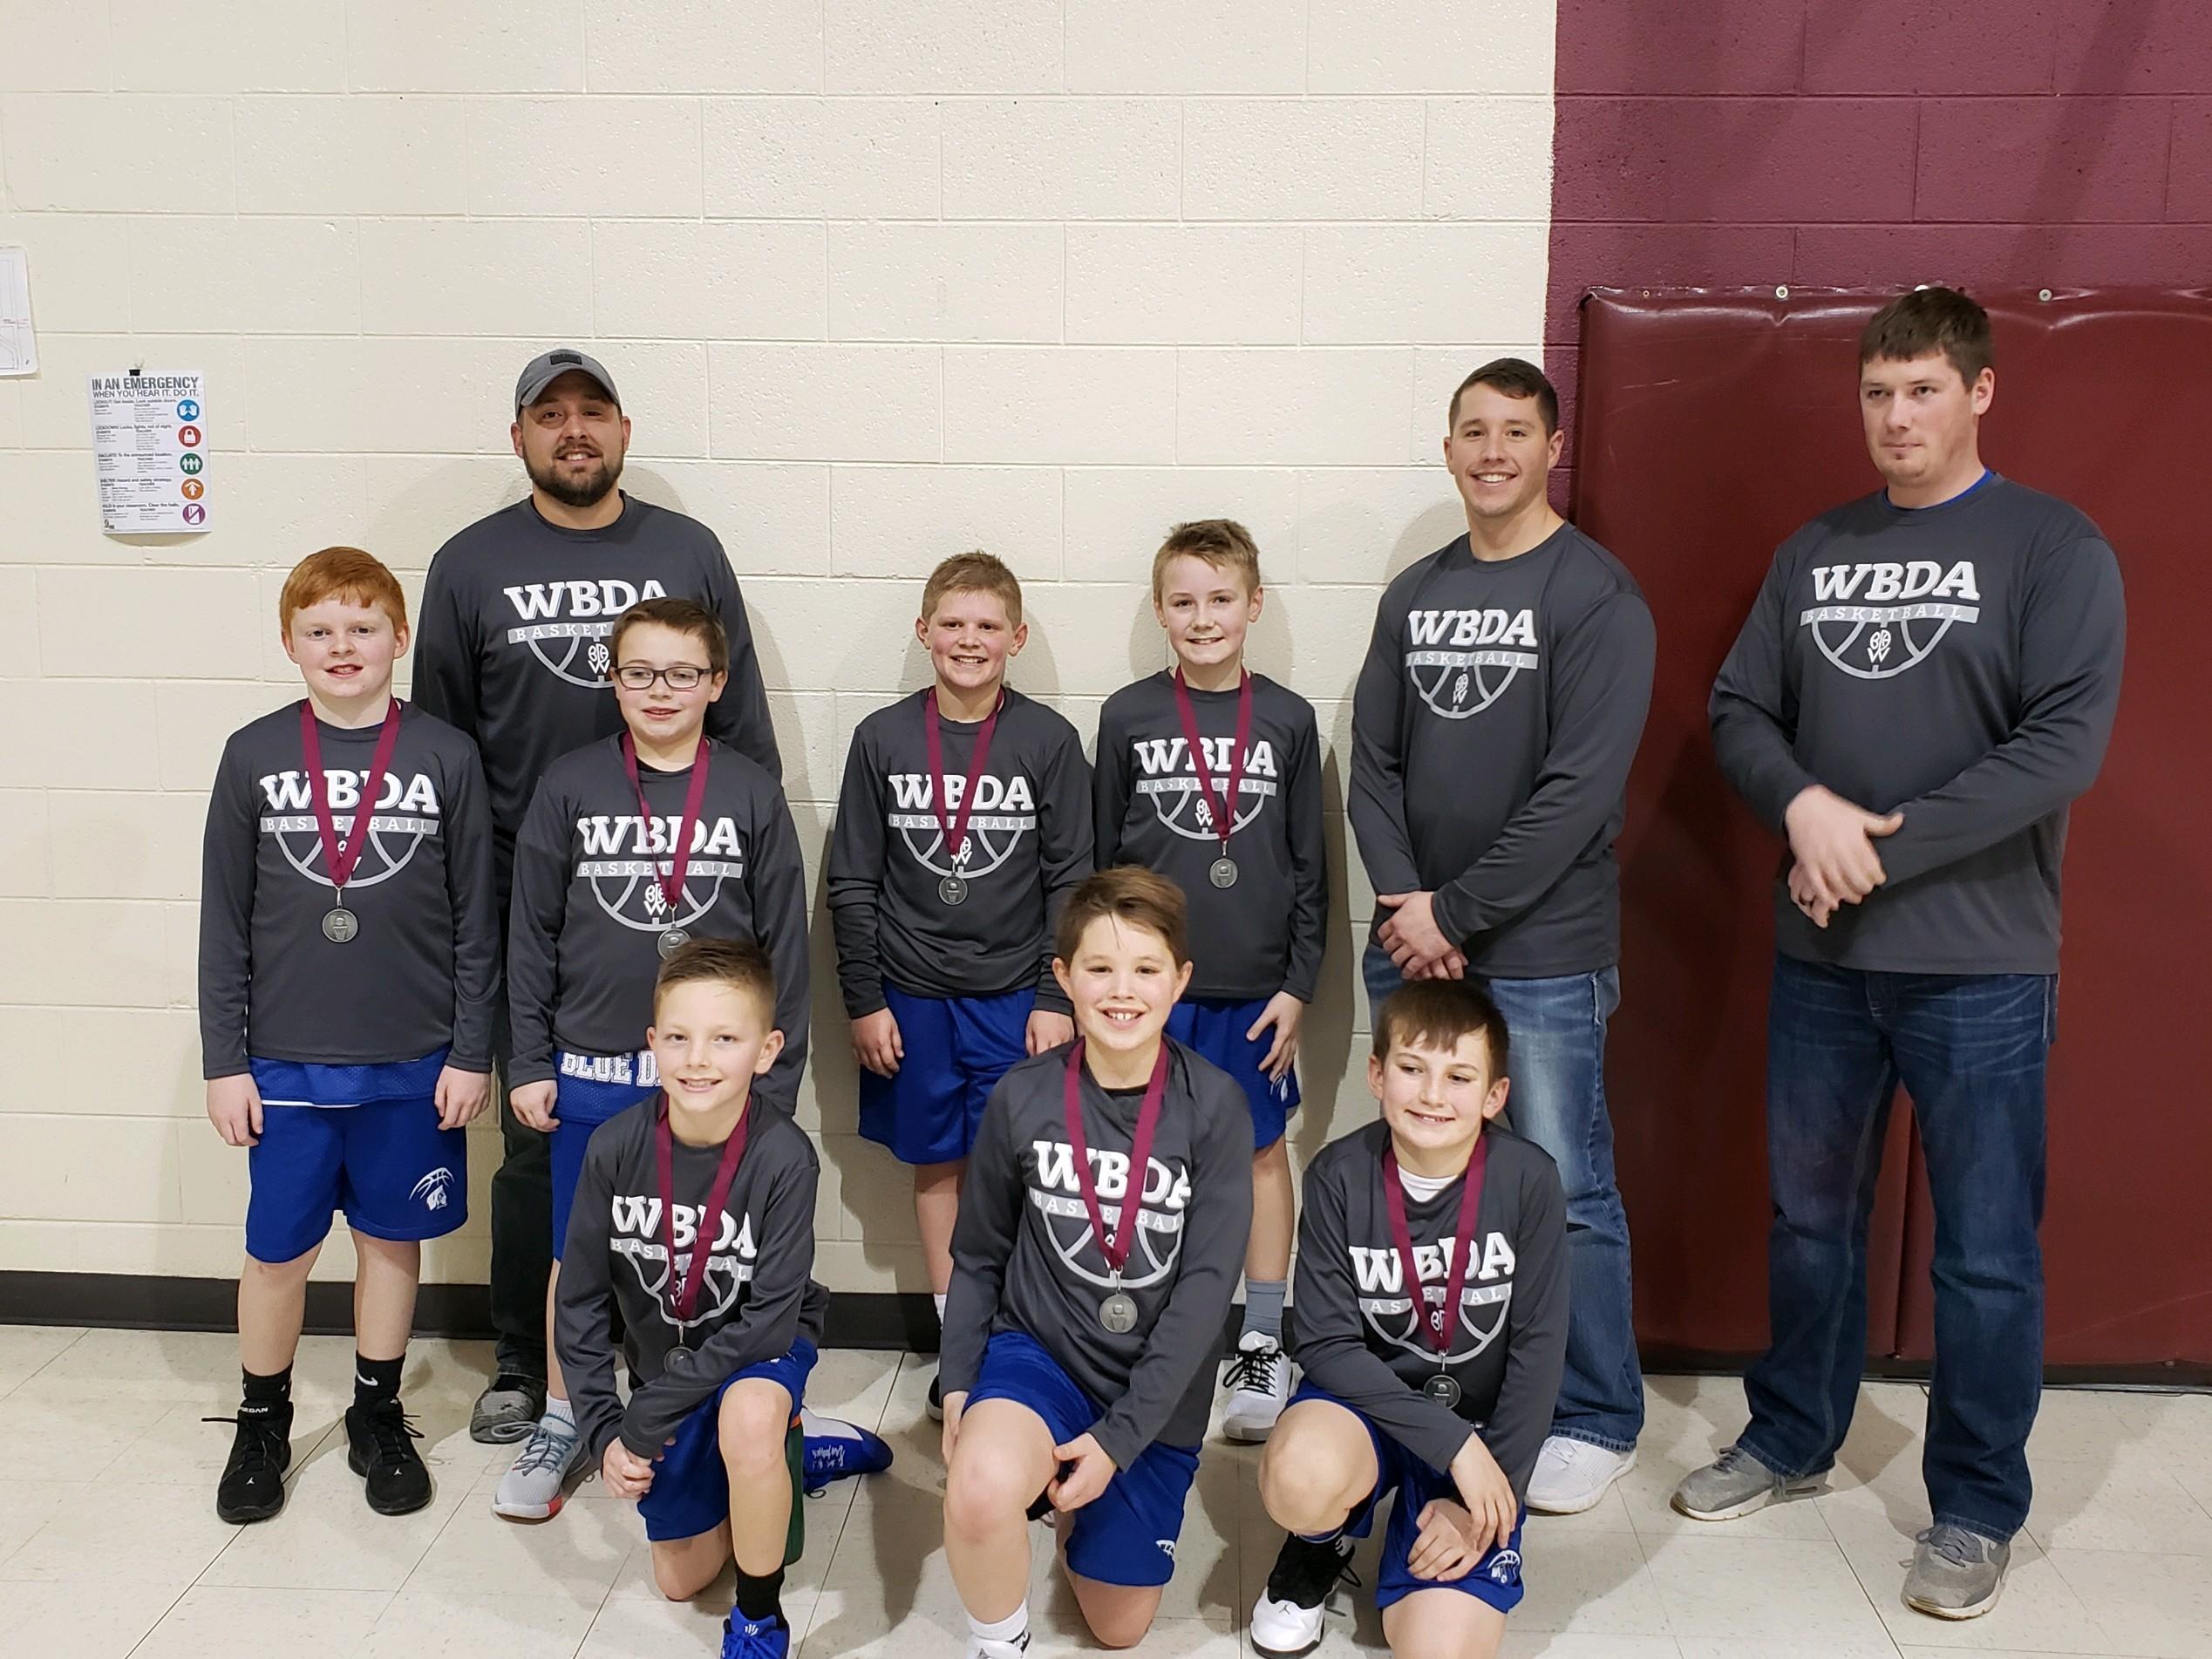 2020 5th Grade Boys Blue - Crofton 2nd Place